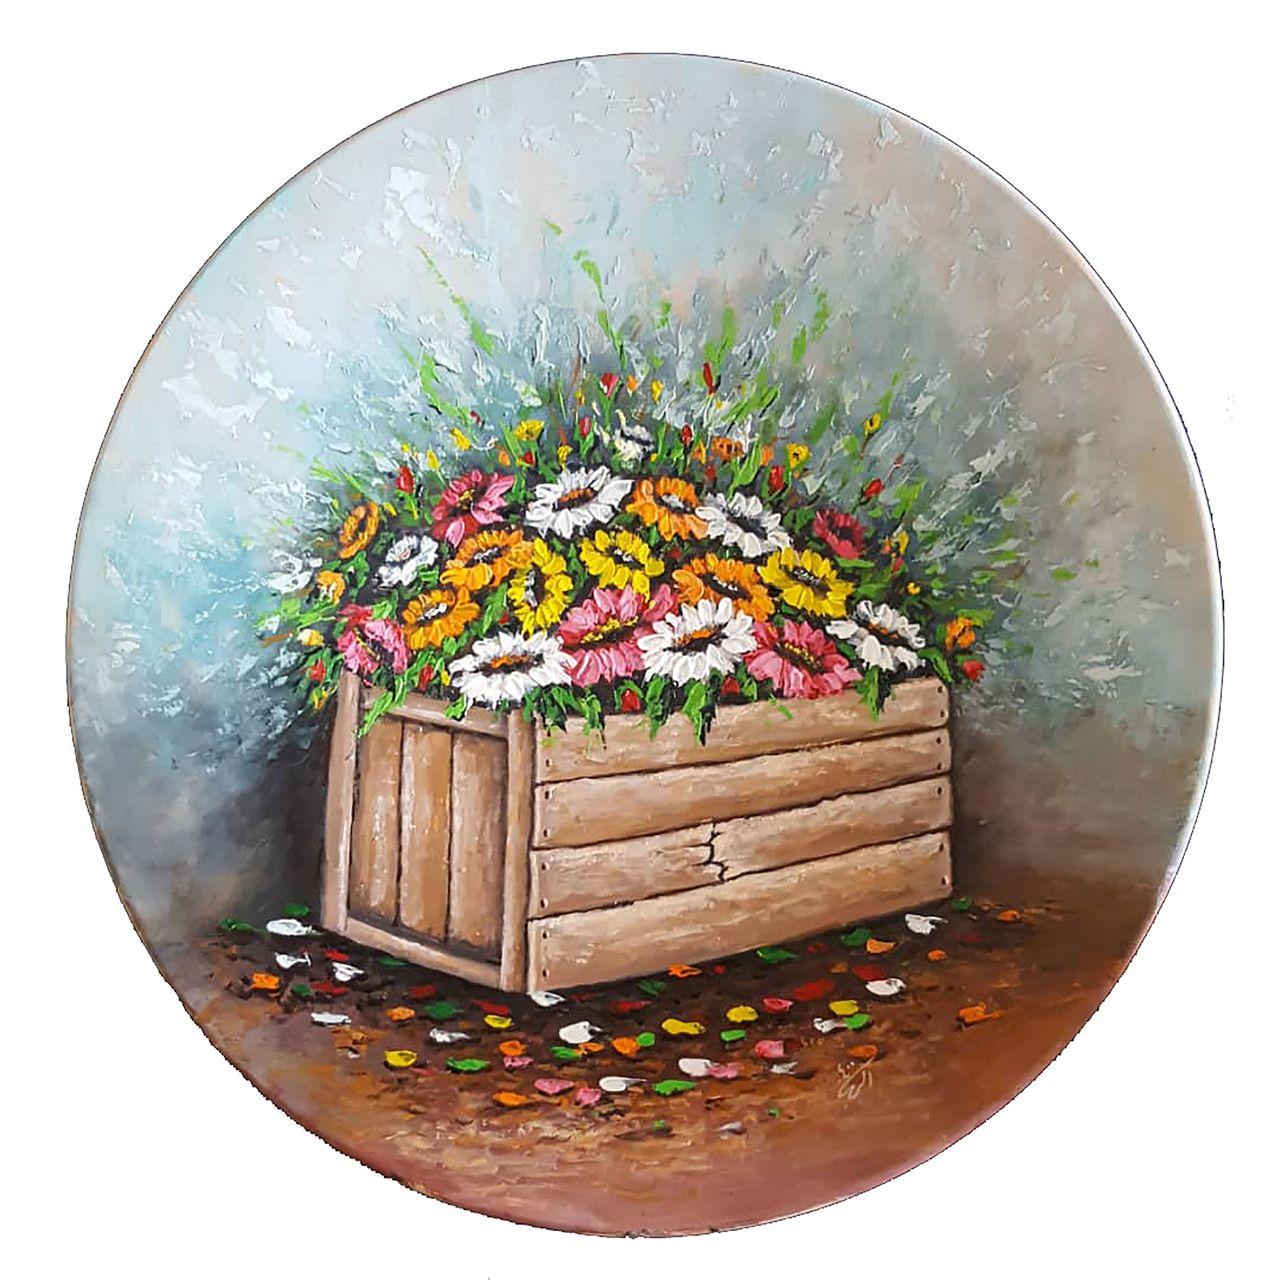 بشقاب دیوارکوب سفالی طرح جعبه گل بهاری کد AAM021